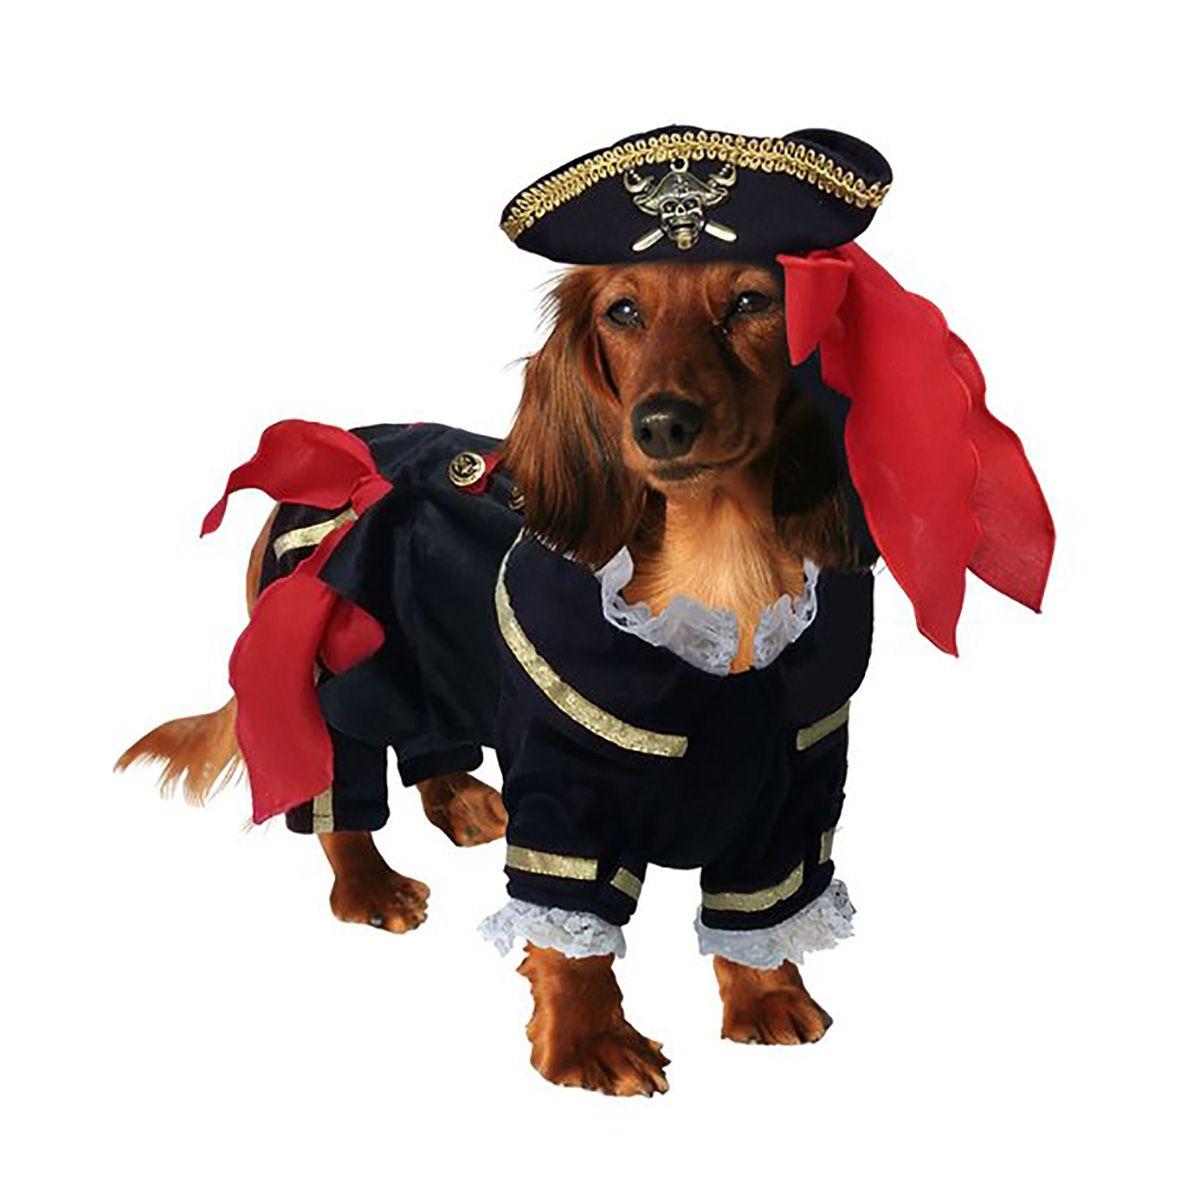 Buccaneer Pirate Dog Costume Dog Halloween Costumes Dog